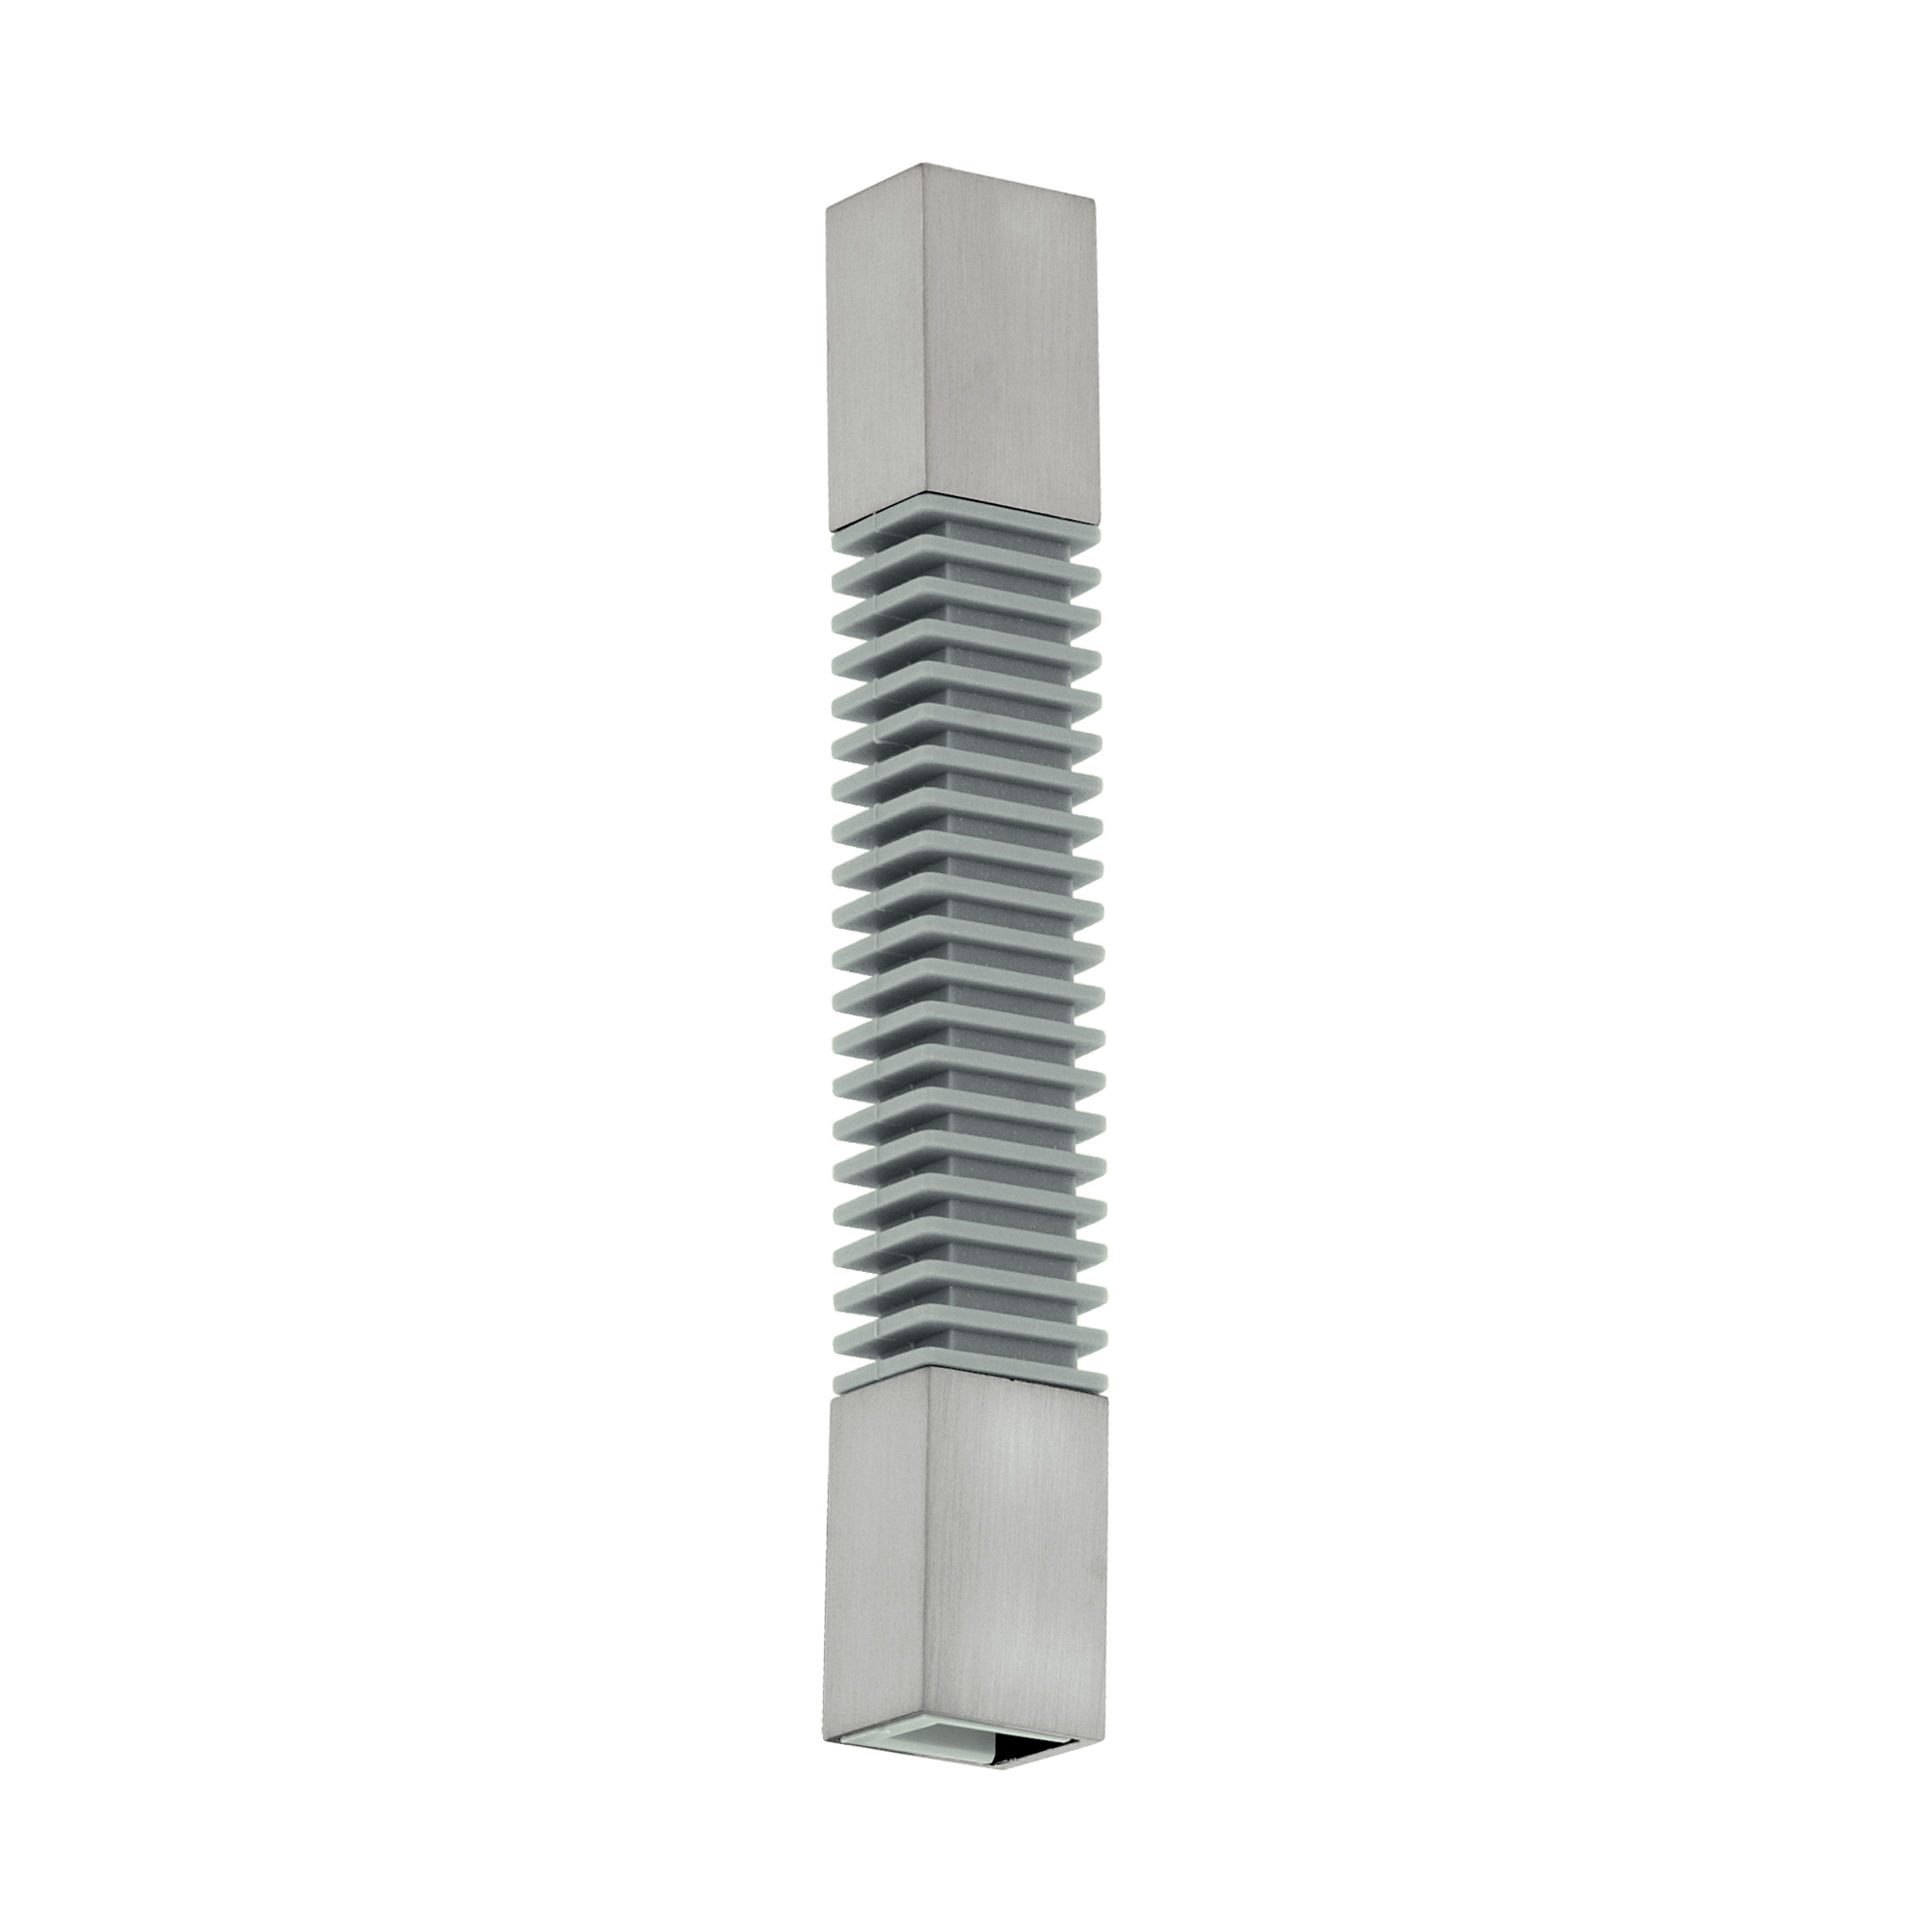 1 Stk Flexverbinder Villanova 1 nickelmatt IP20 LI61497---